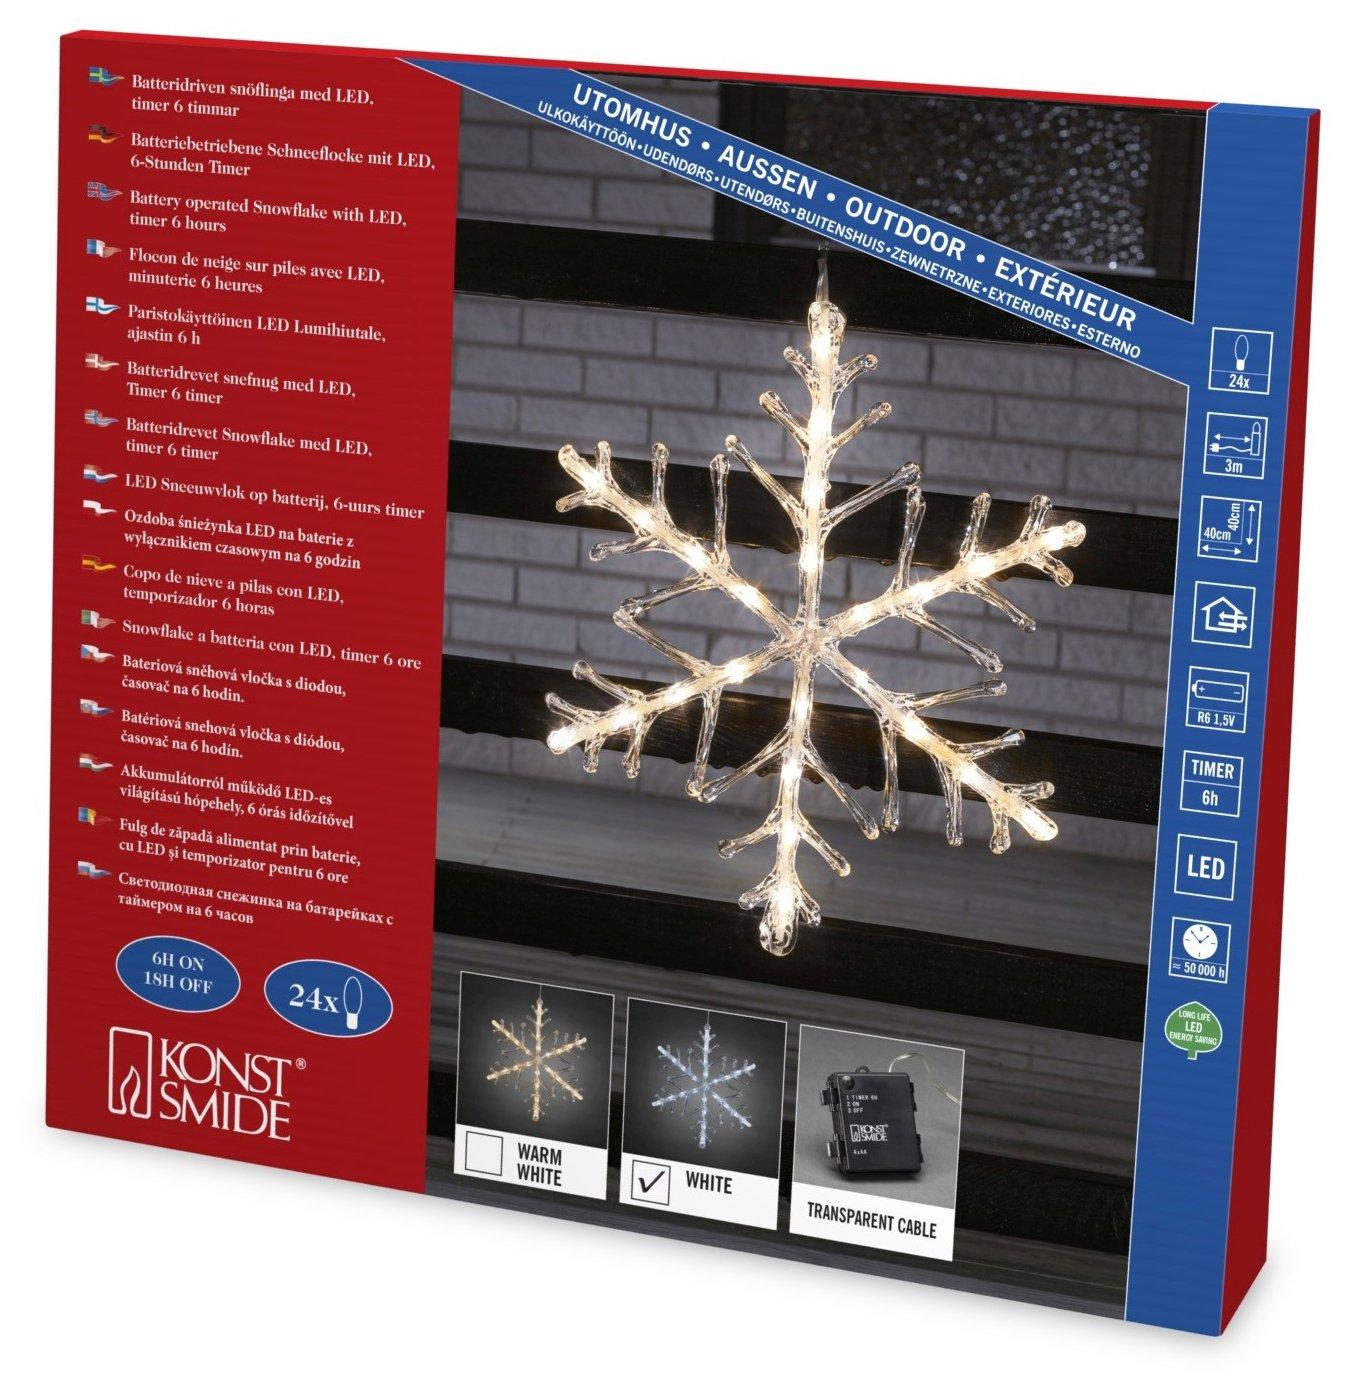 Konstsmide 4540-103 LED Acrylsilhouette'Schneeflocke' / fü r Auß en (IP44) / Batteriebetrieben: 4xAA 1.5V (exkl.) / mit 6h Timer / 24 warm weiß e Diode/transparentes Kabel